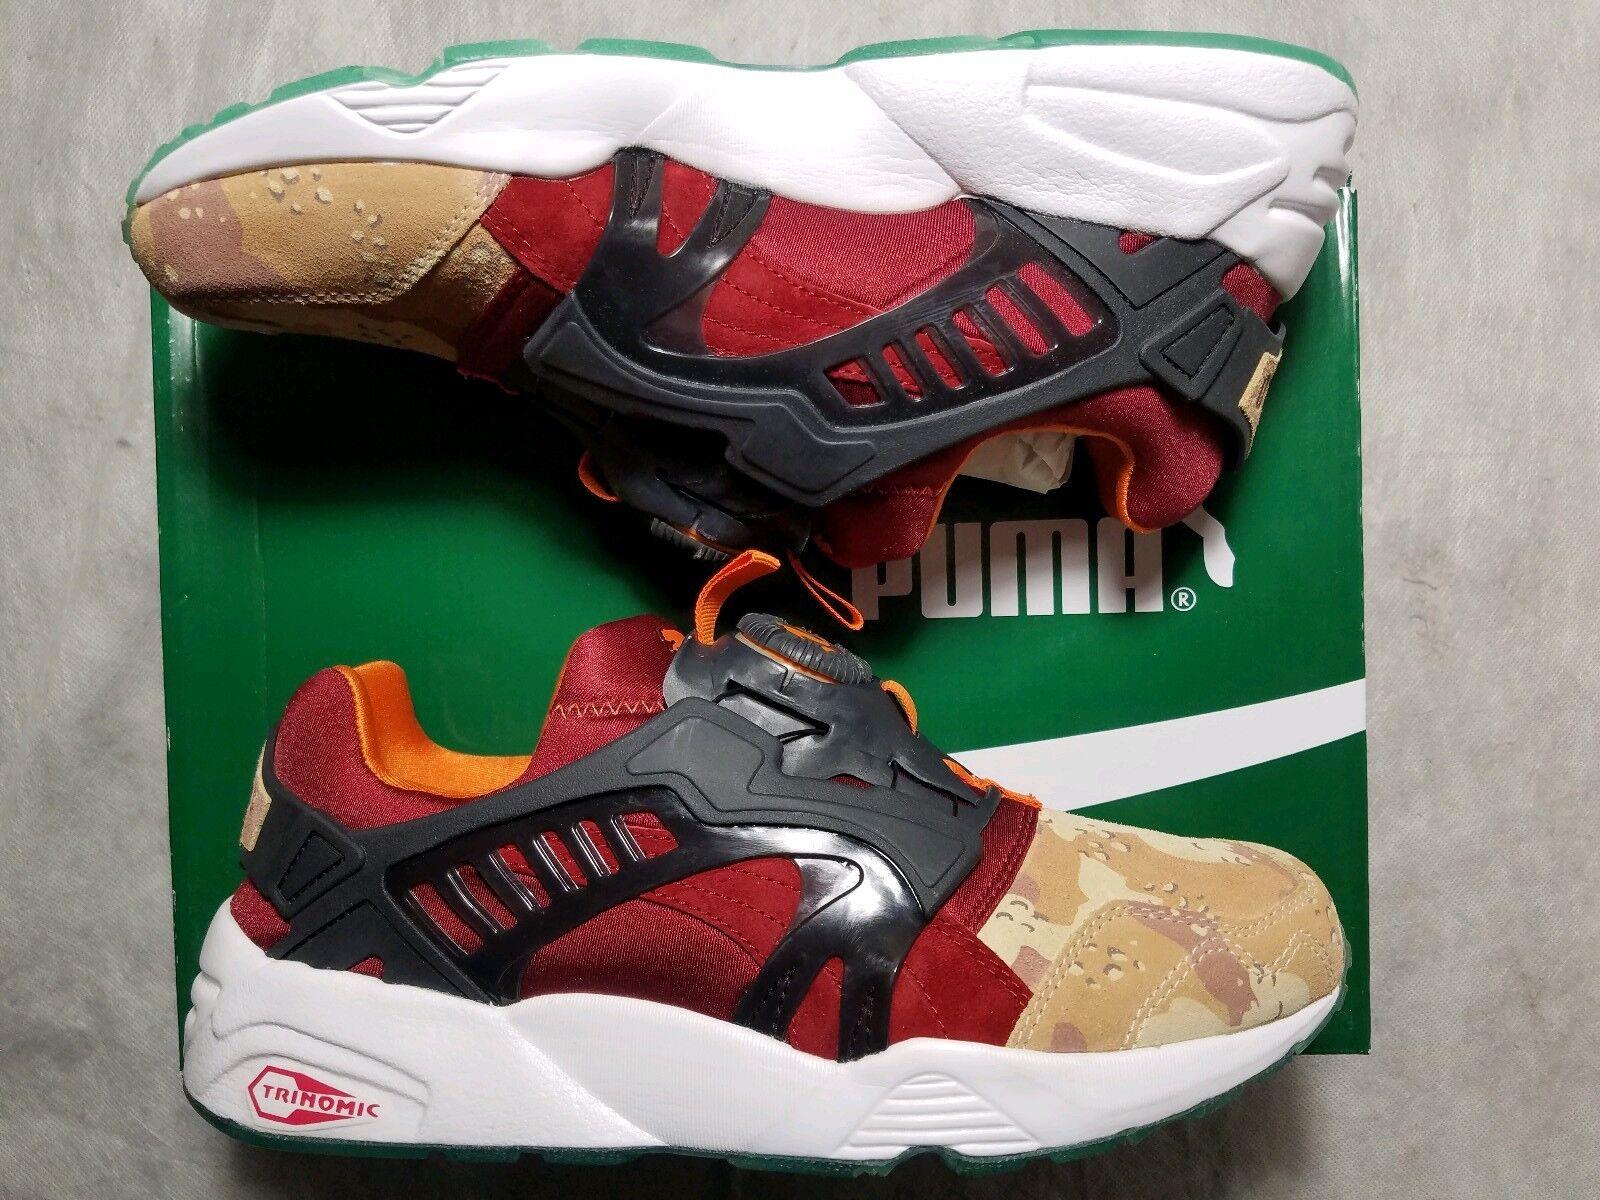 Puma Disc Blaze Desert Dusk Camo Atmos Titolo Men 8.5 Navy Red shoes 363063-01